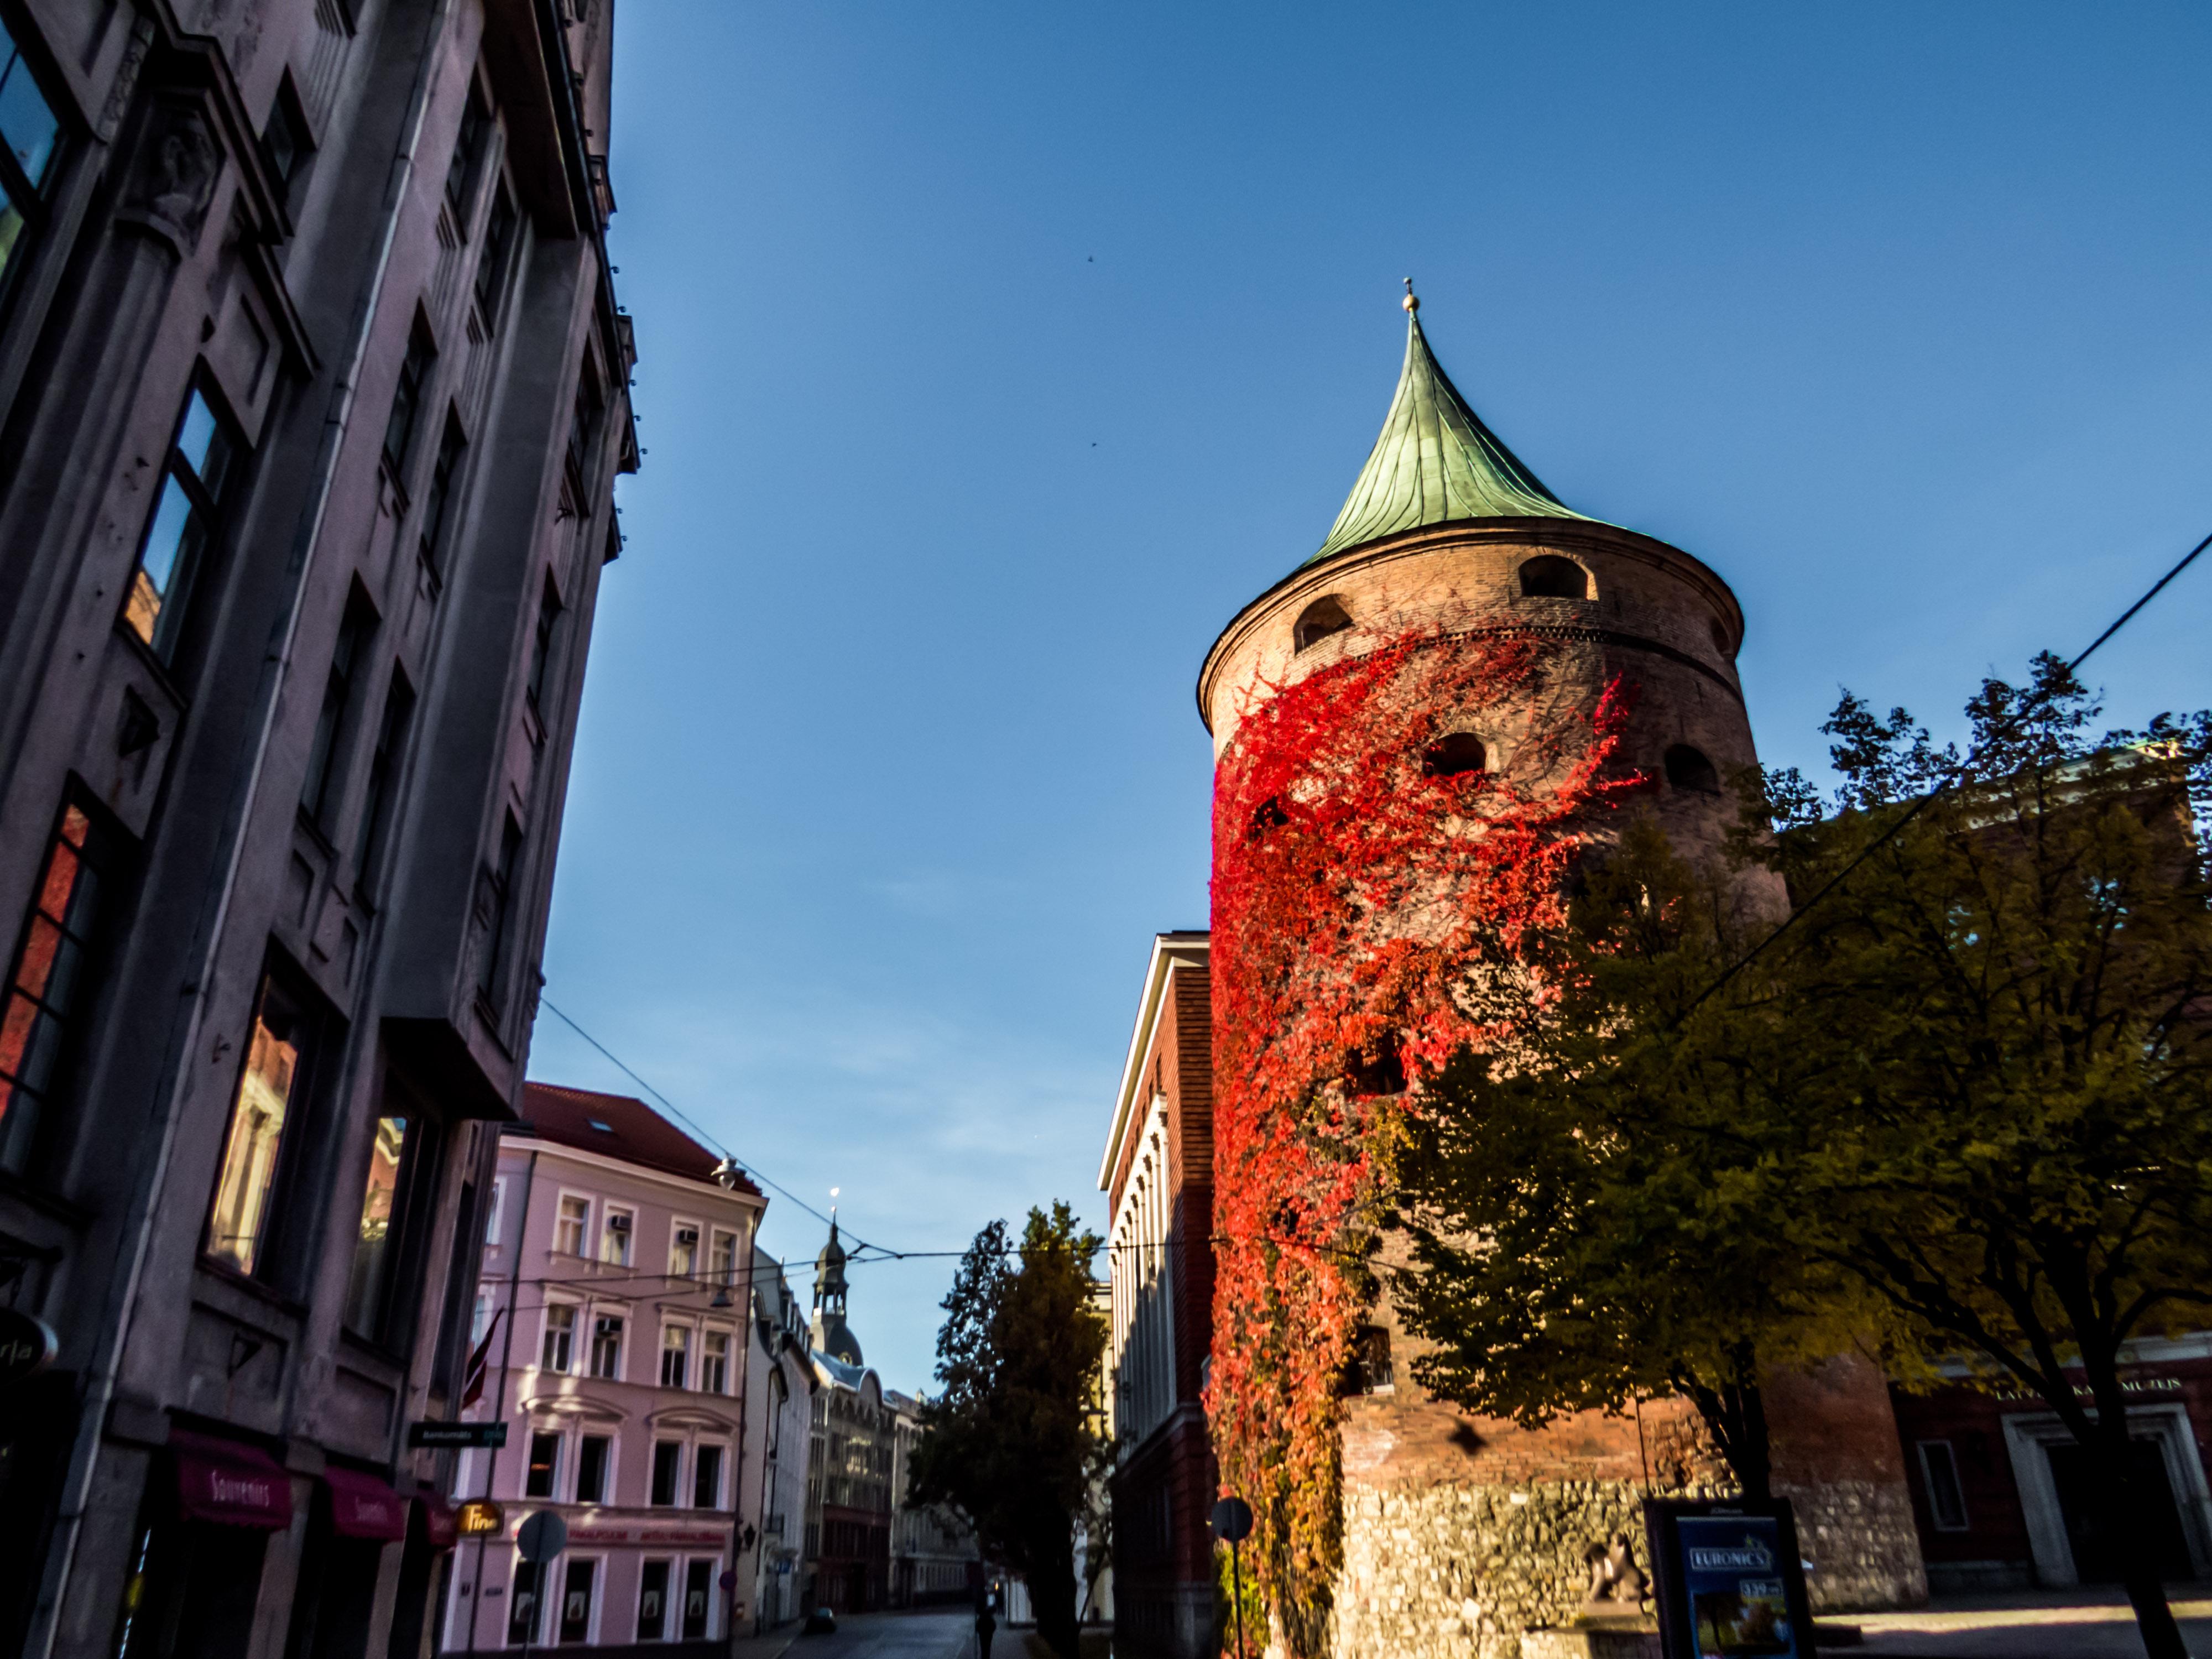 Powder Tower, Riga, Autumn, Beautiful, Building, City, HQ Photo